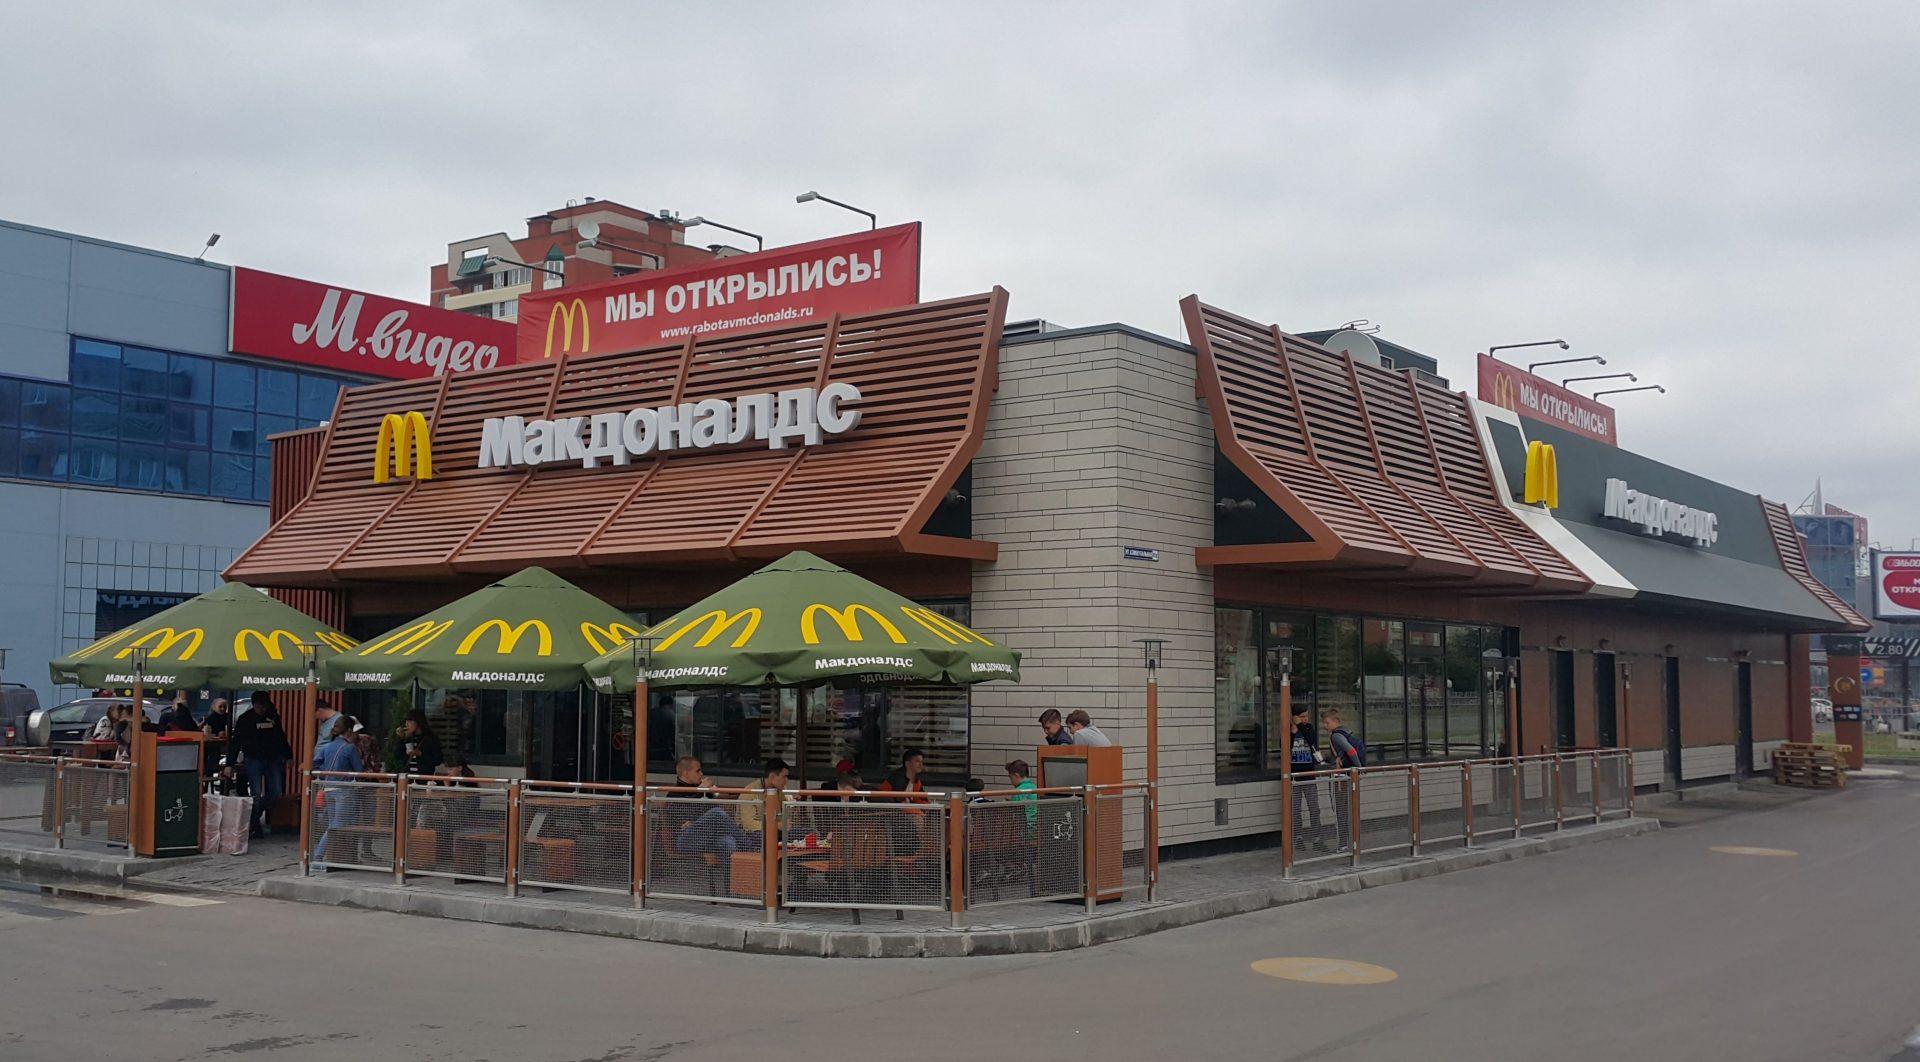 Ресторан Макдоналдс, г. Псков